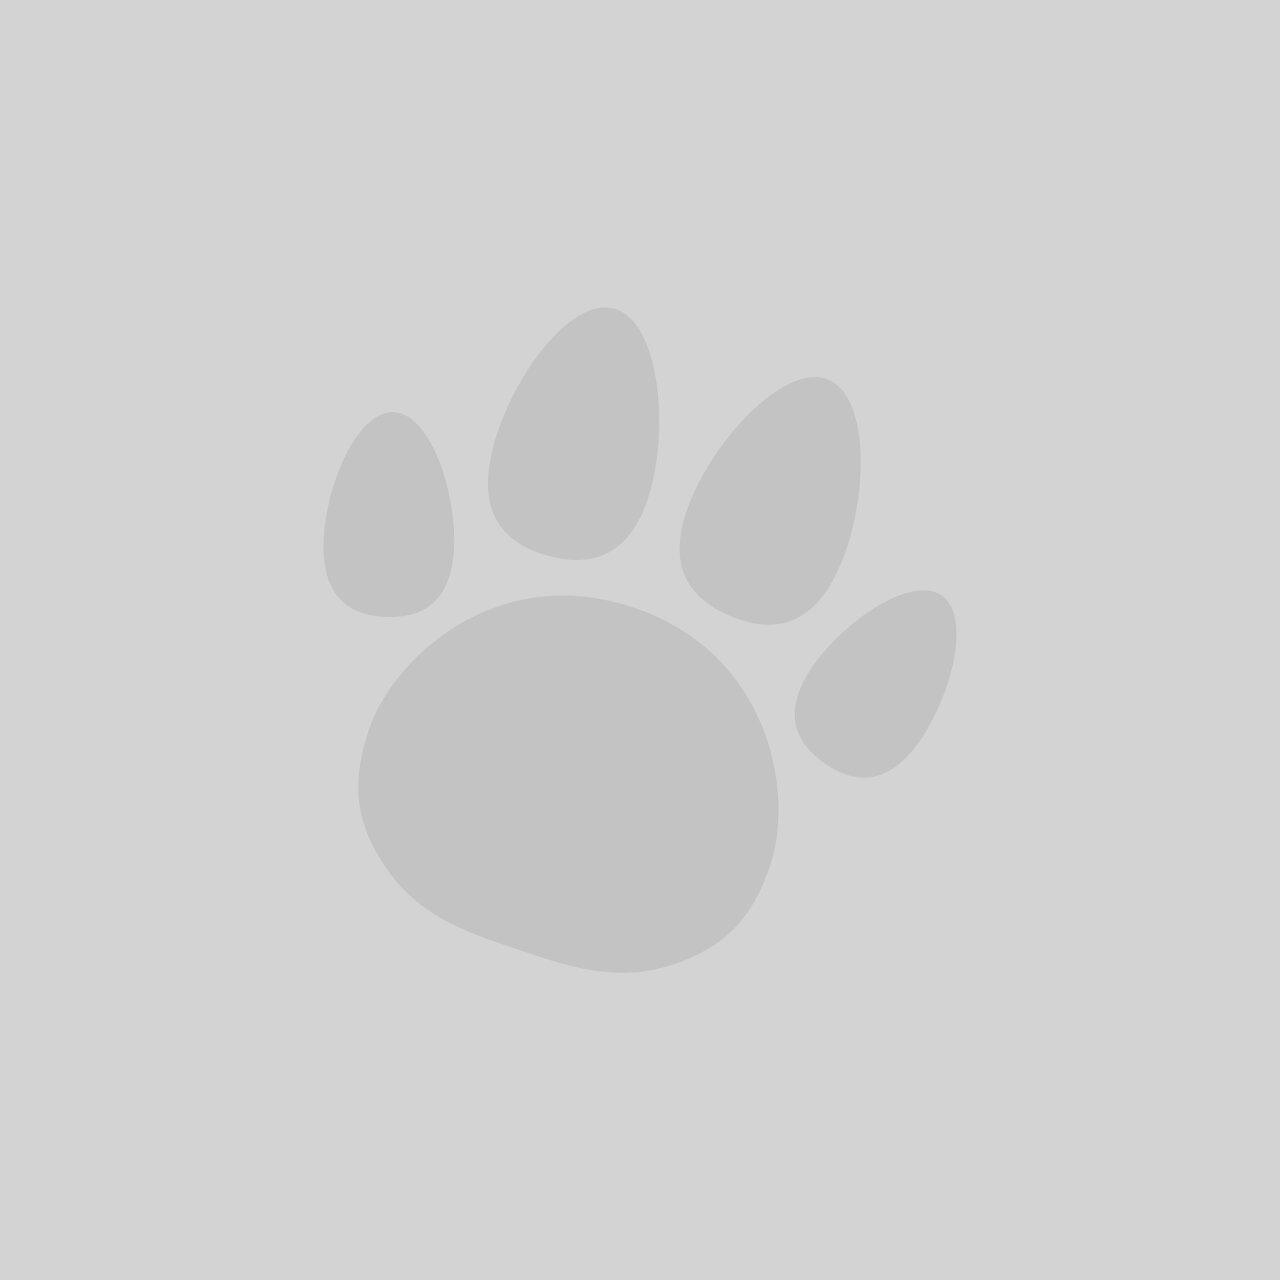 Chudleys Working Crunch Dog Food 15kg